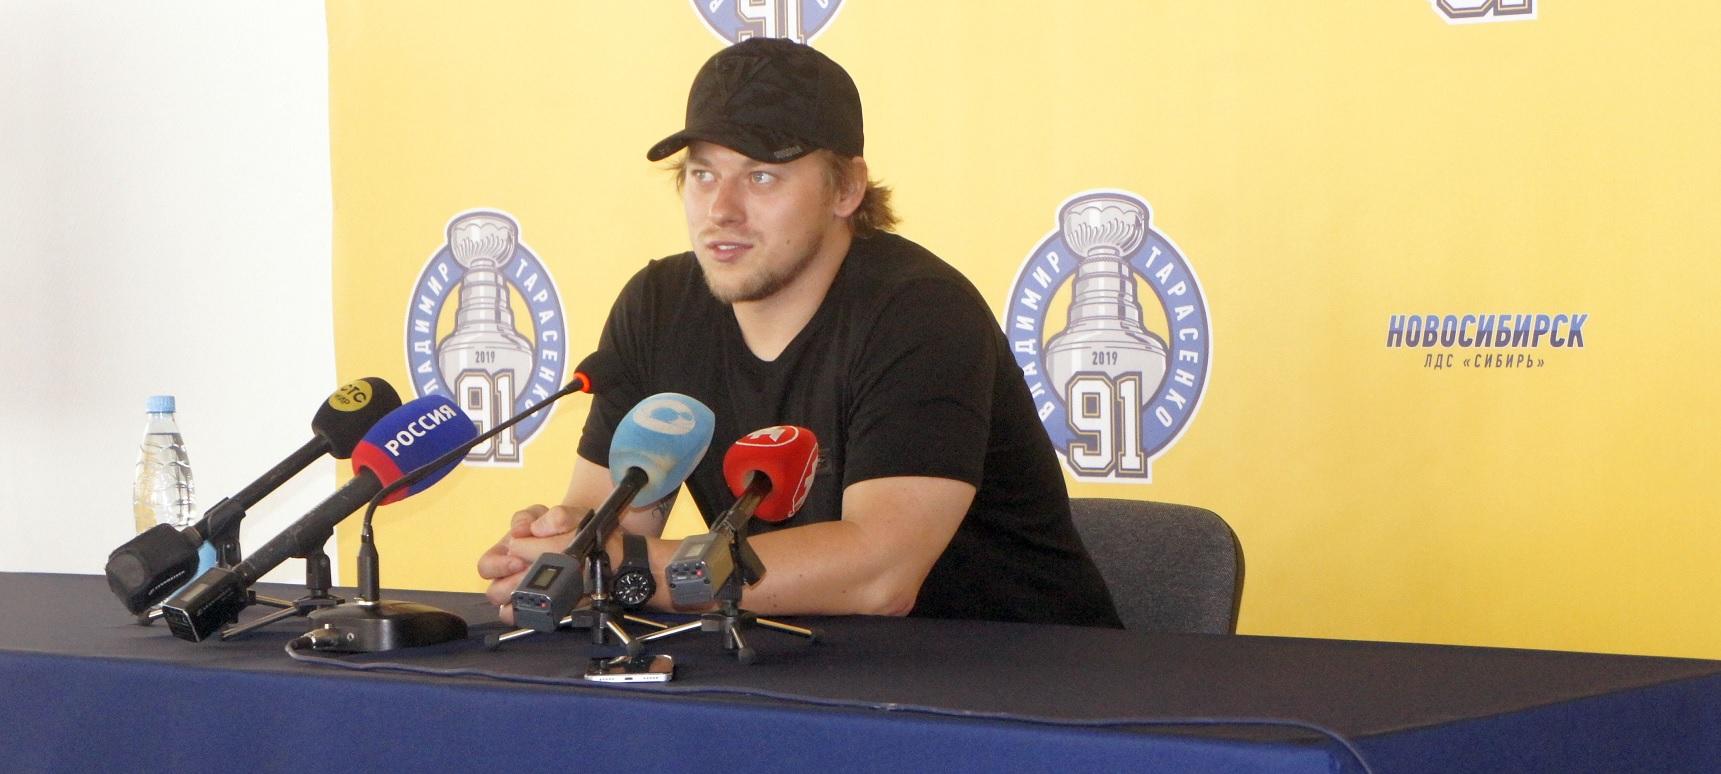 Владимир Тарасенко в Новосибирске